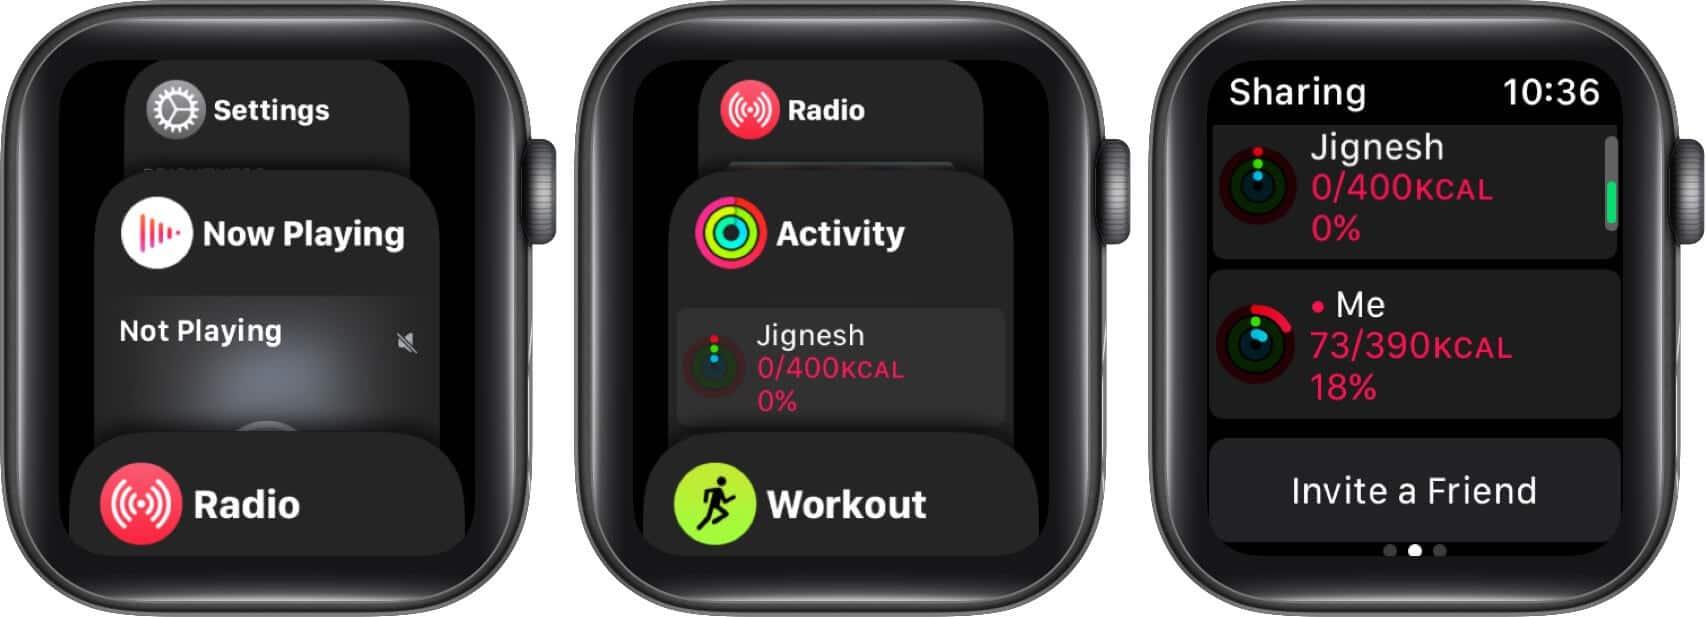 switch between apps in app switcher on apple watch